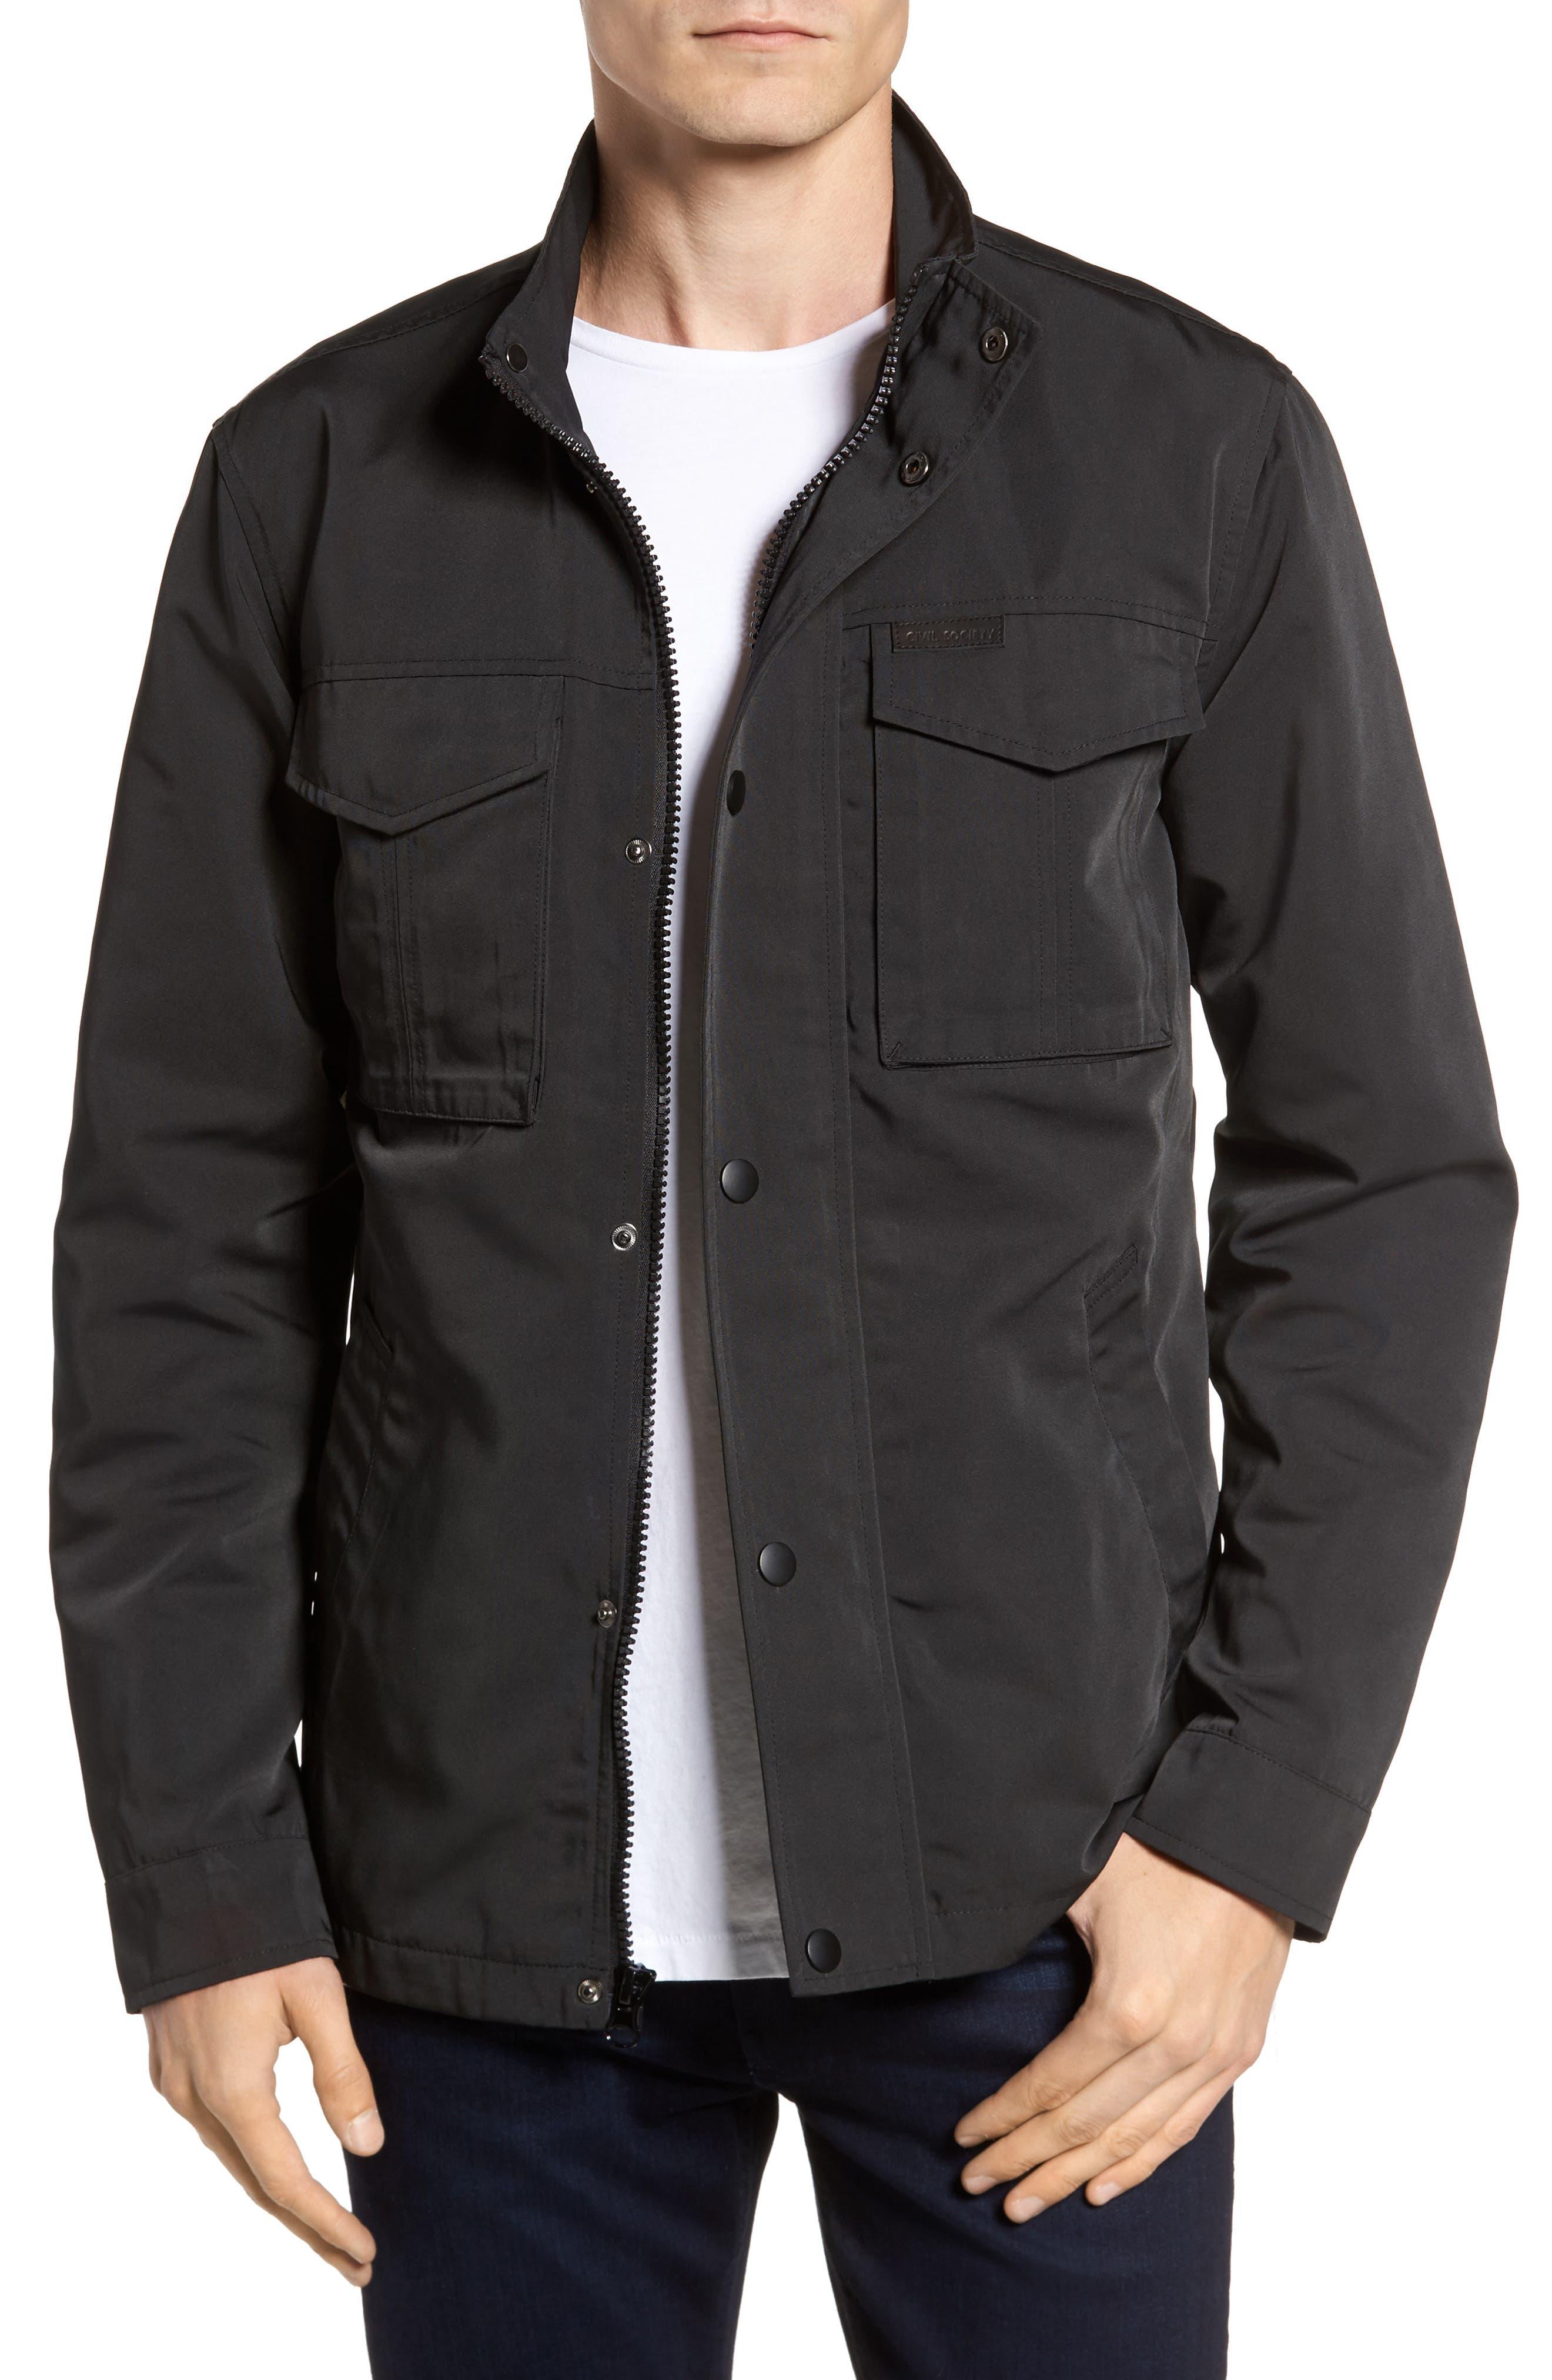 Main Image - Civil Society Dougie Waterproof Jacket